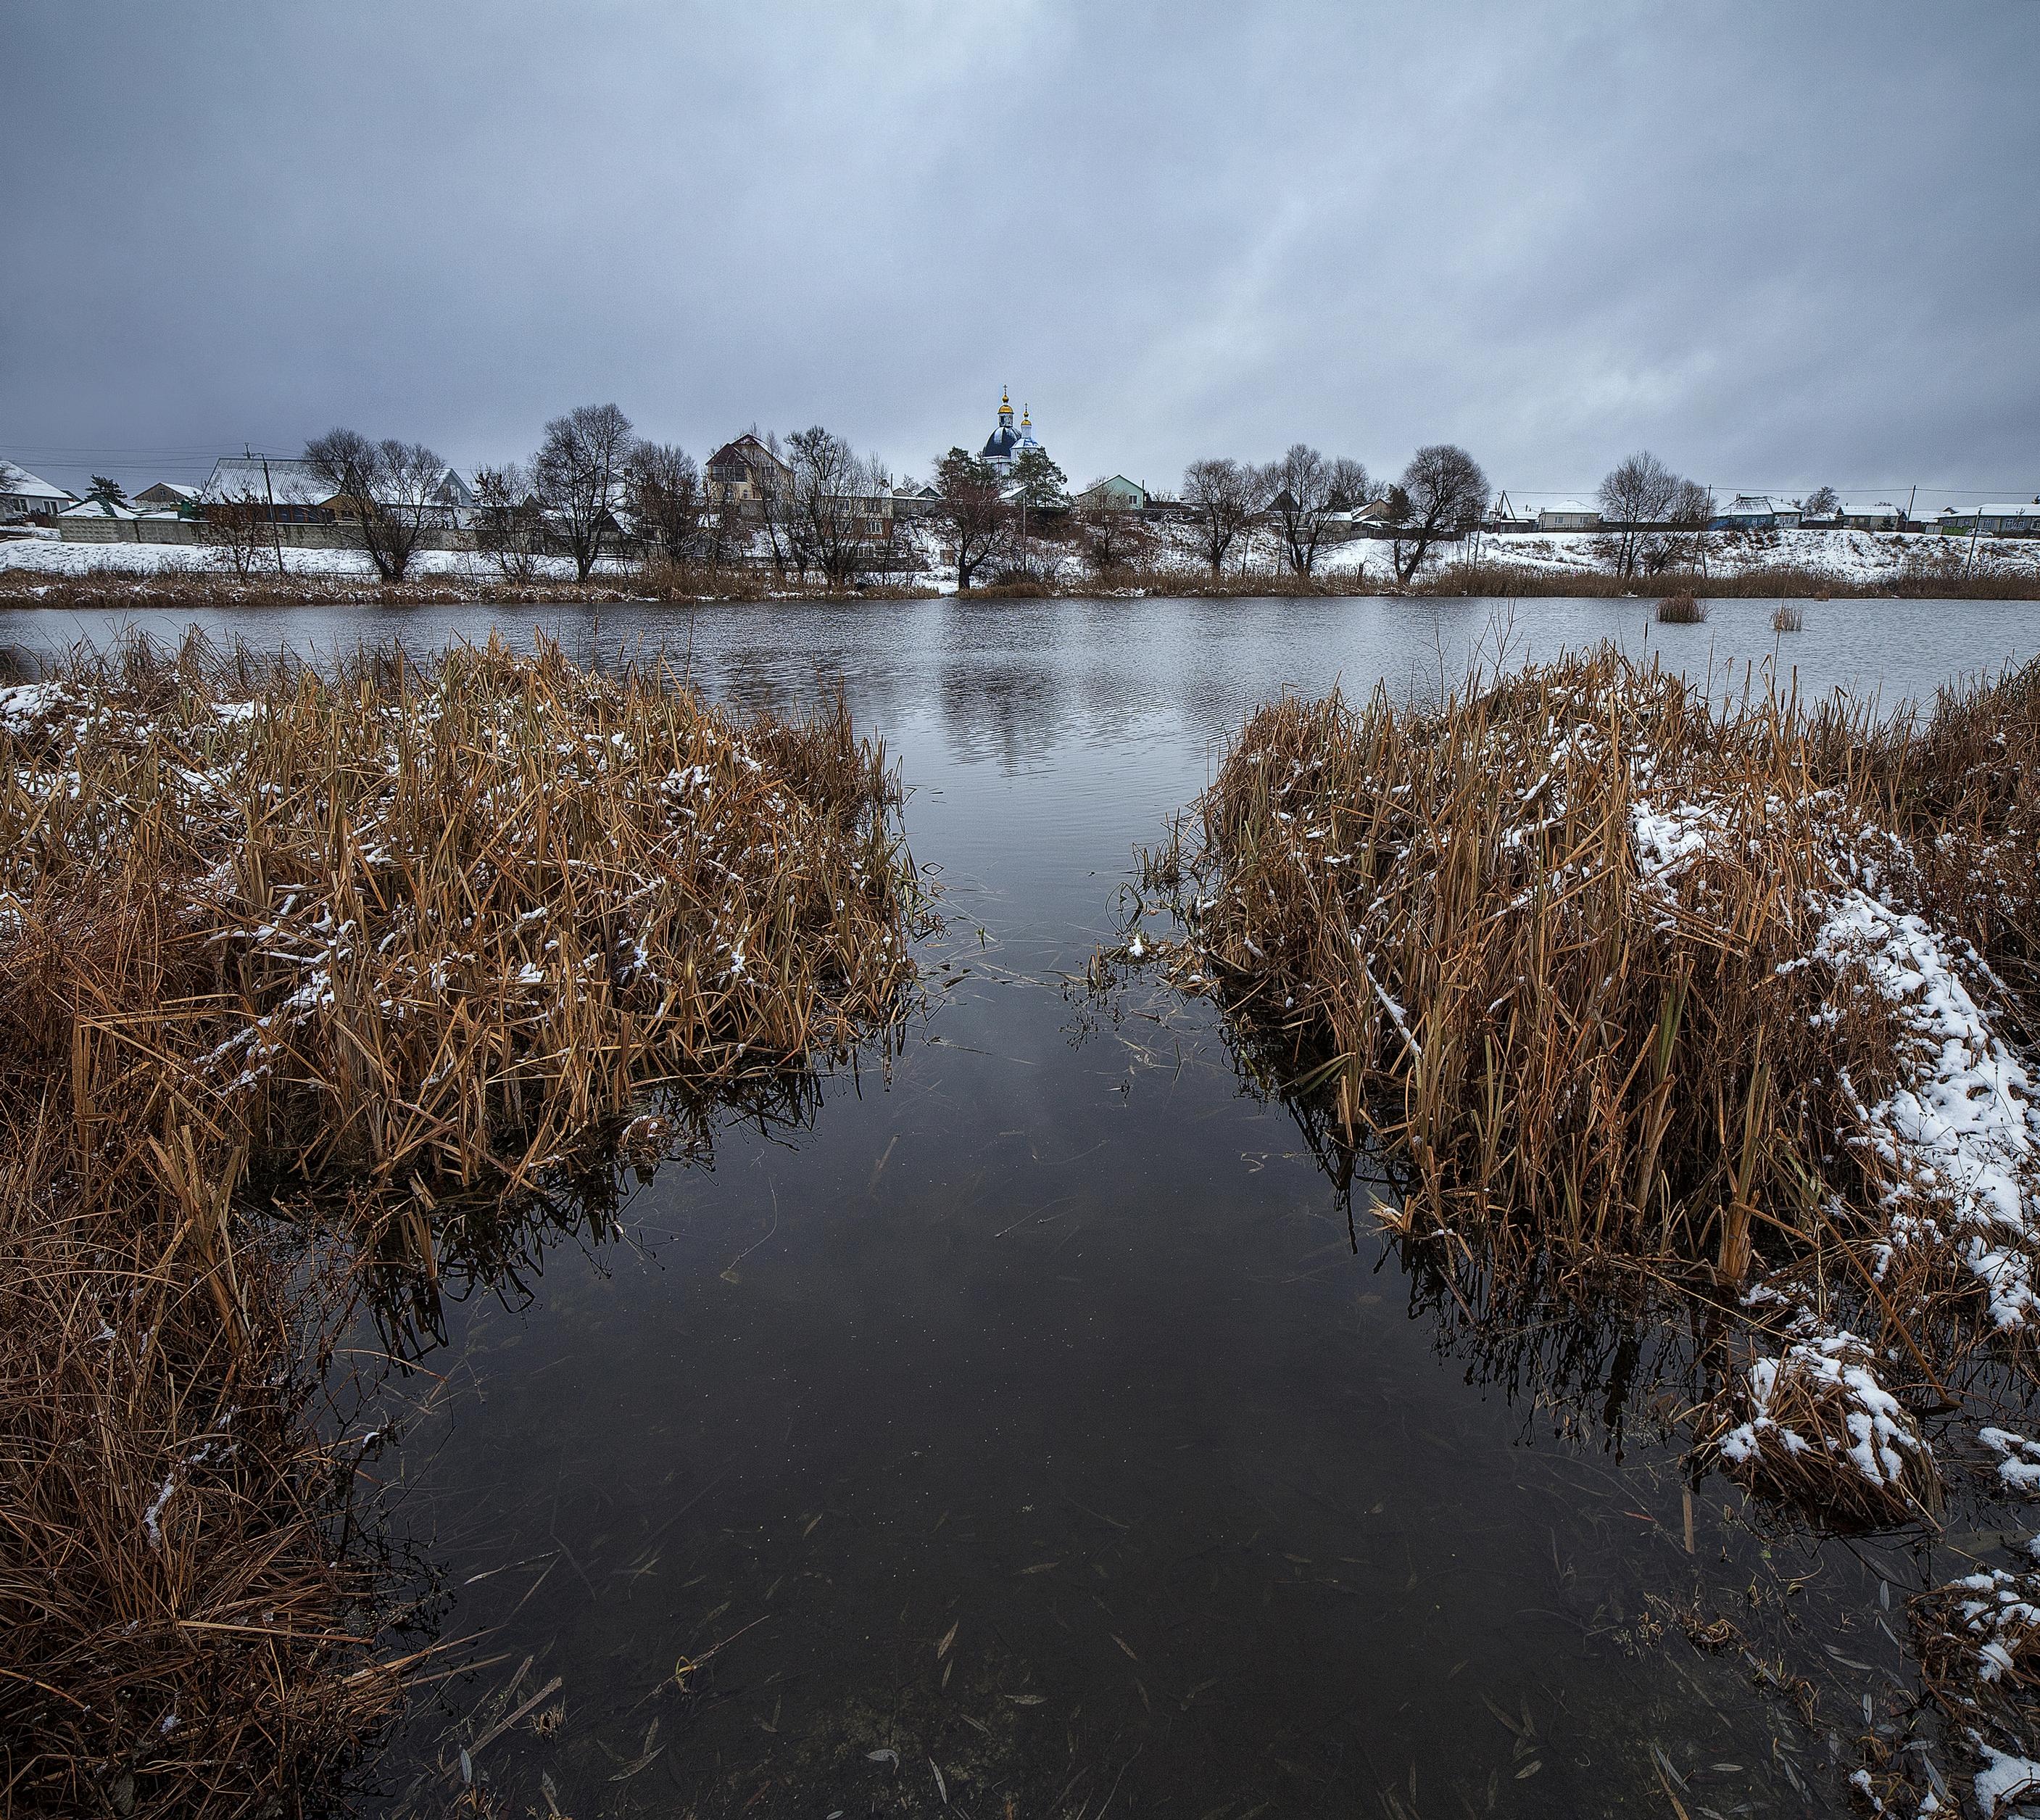 Снежное утро на озере | Николай Зайцев | Фотография #159152